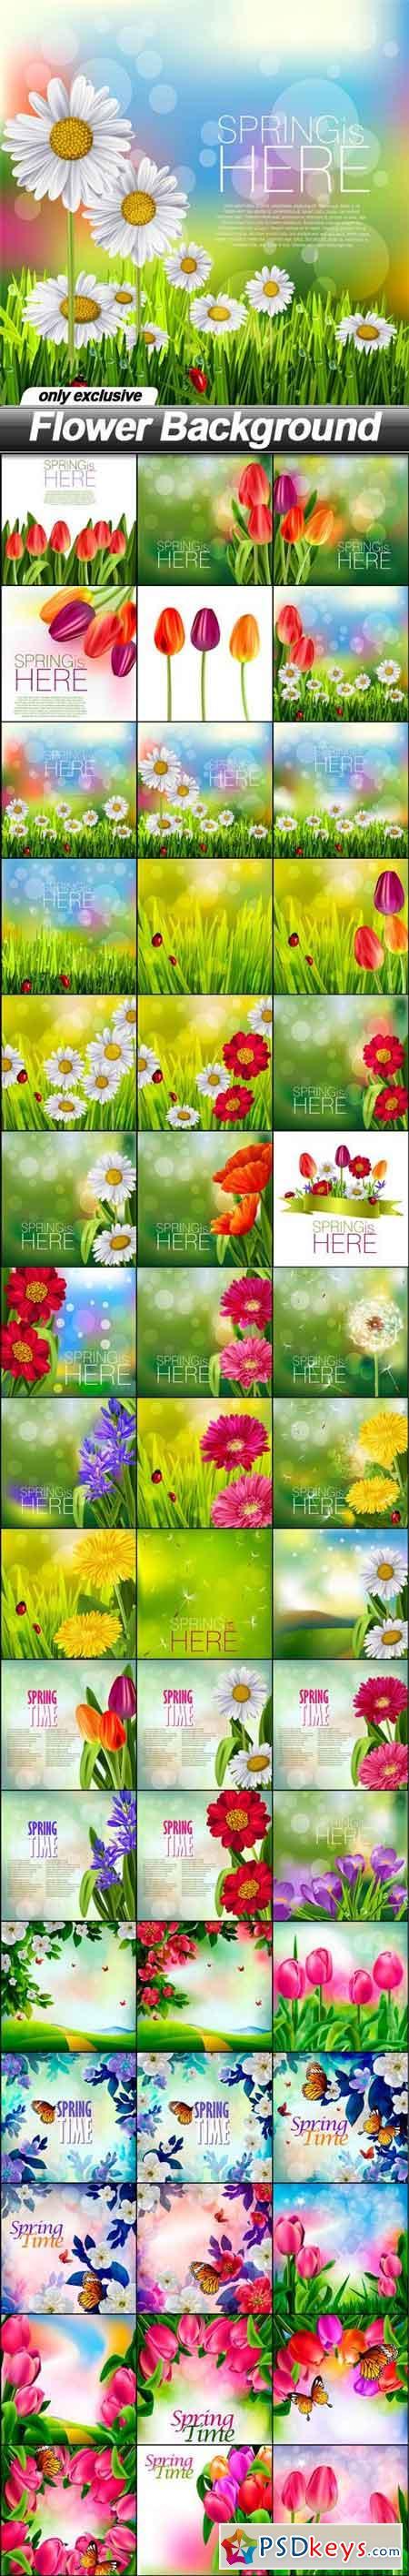 Flower Background - 48 EPS